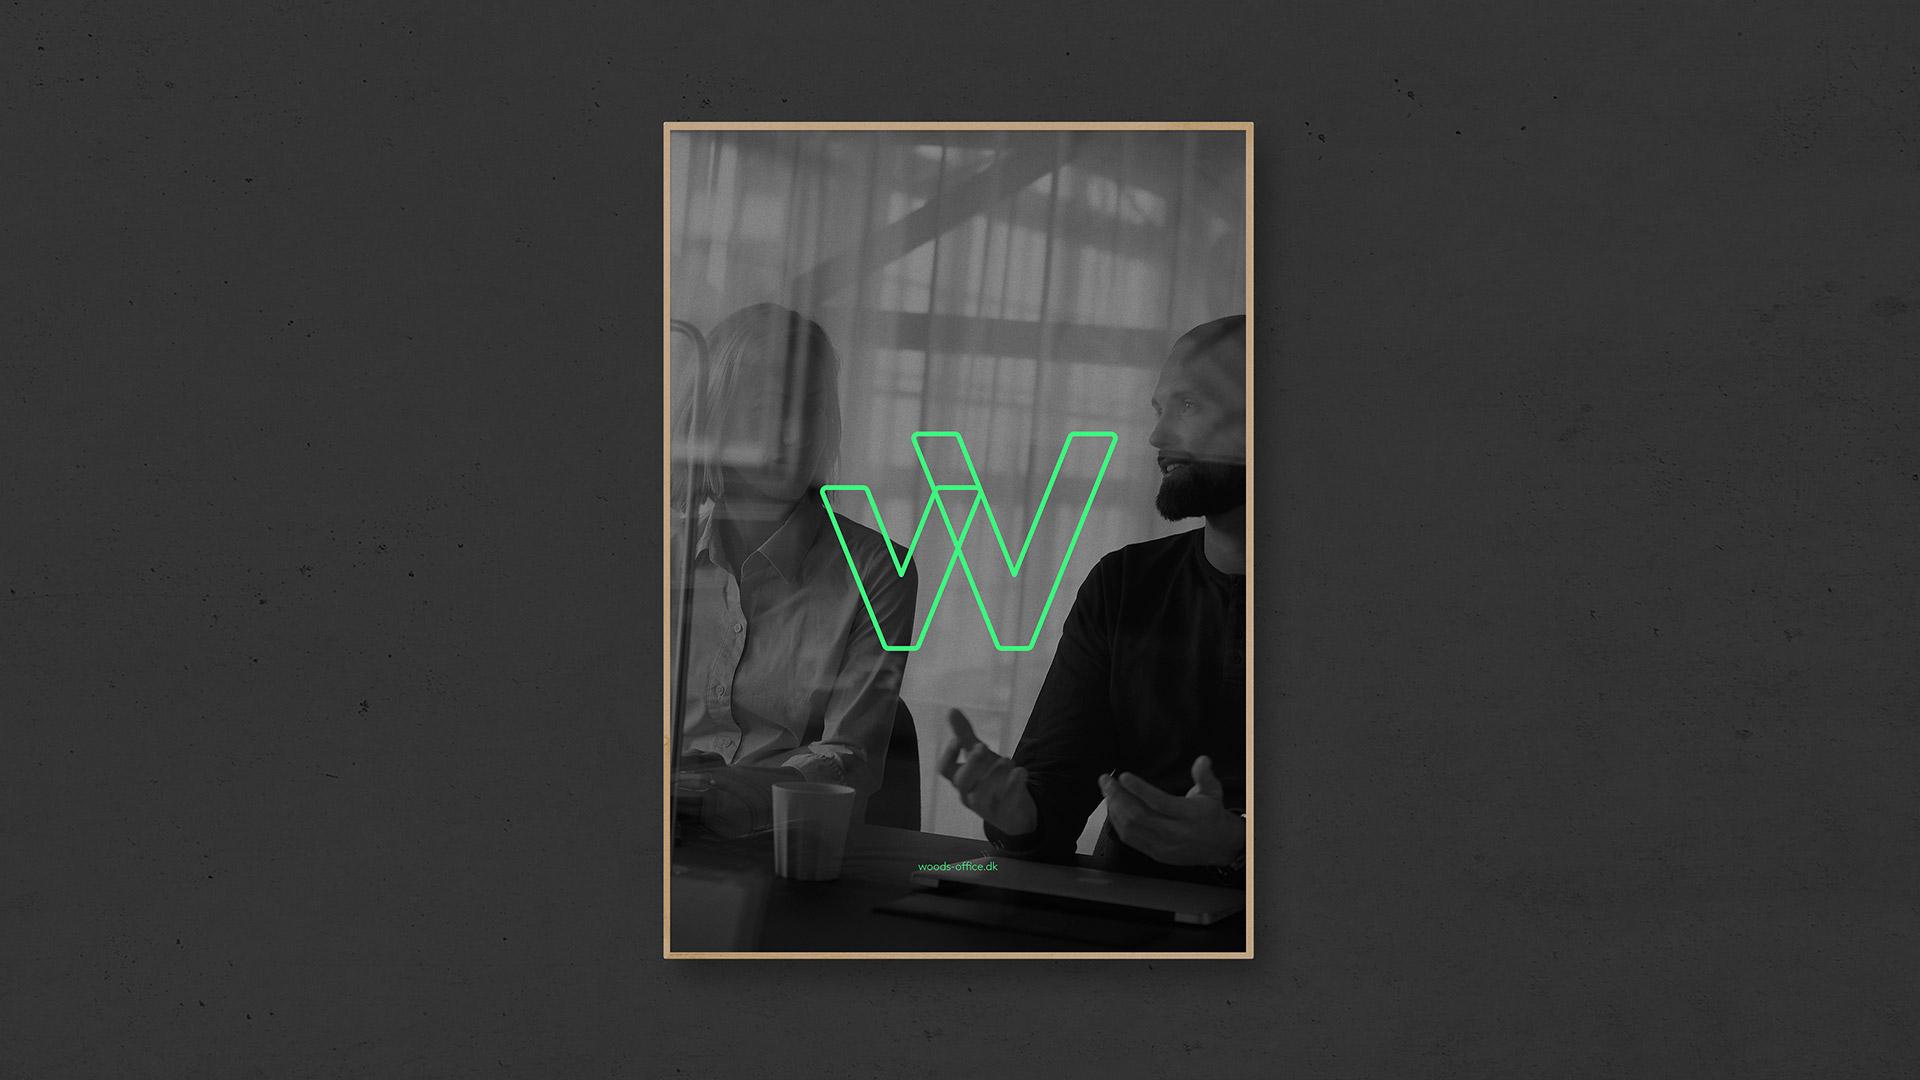 Tetris - Woods - Visuel identitet - Logo